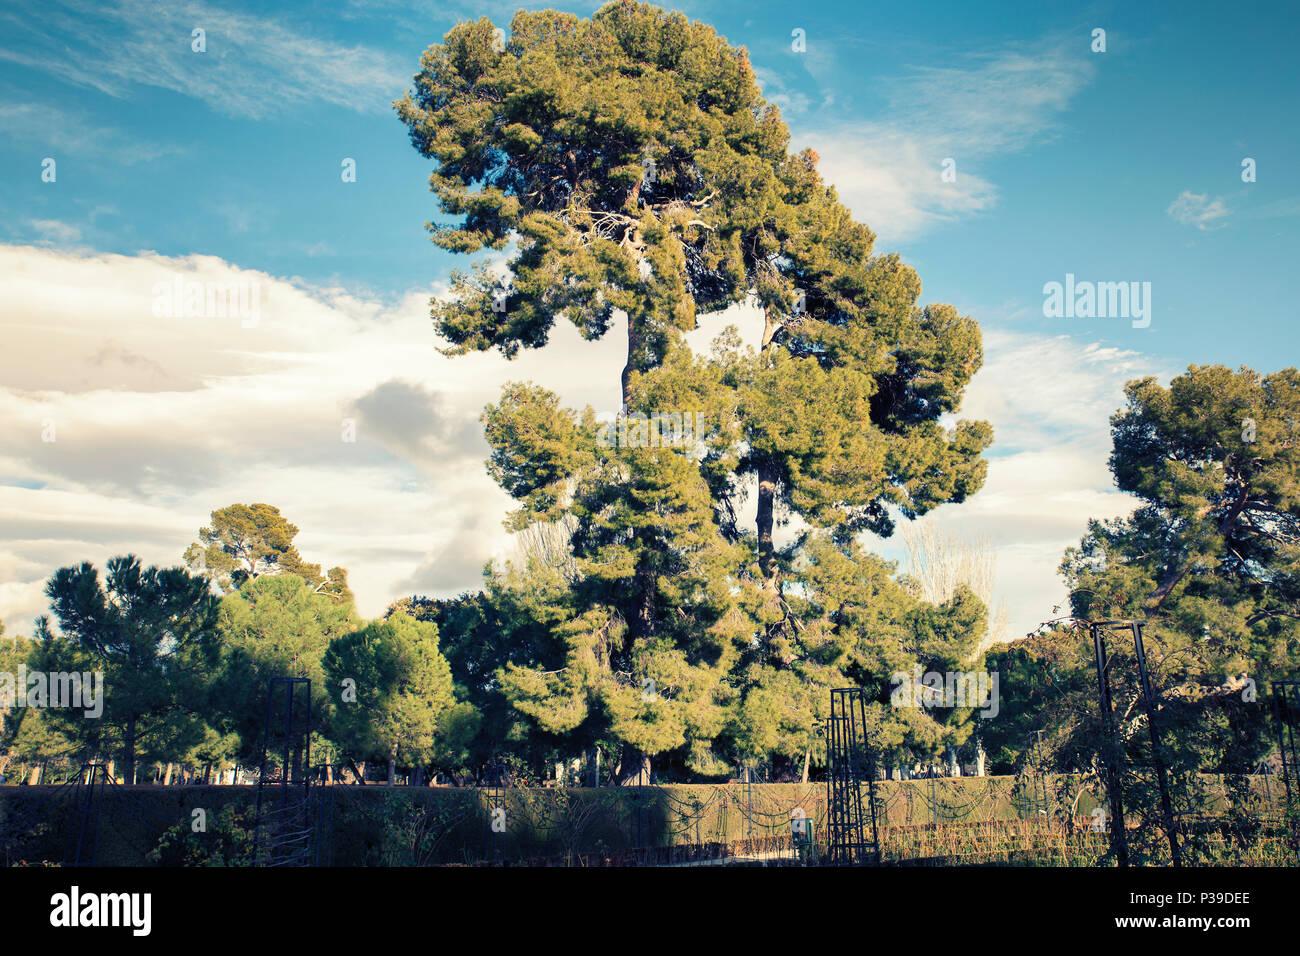 Pines in famous park of madrid. Retiro Park - Stock Image